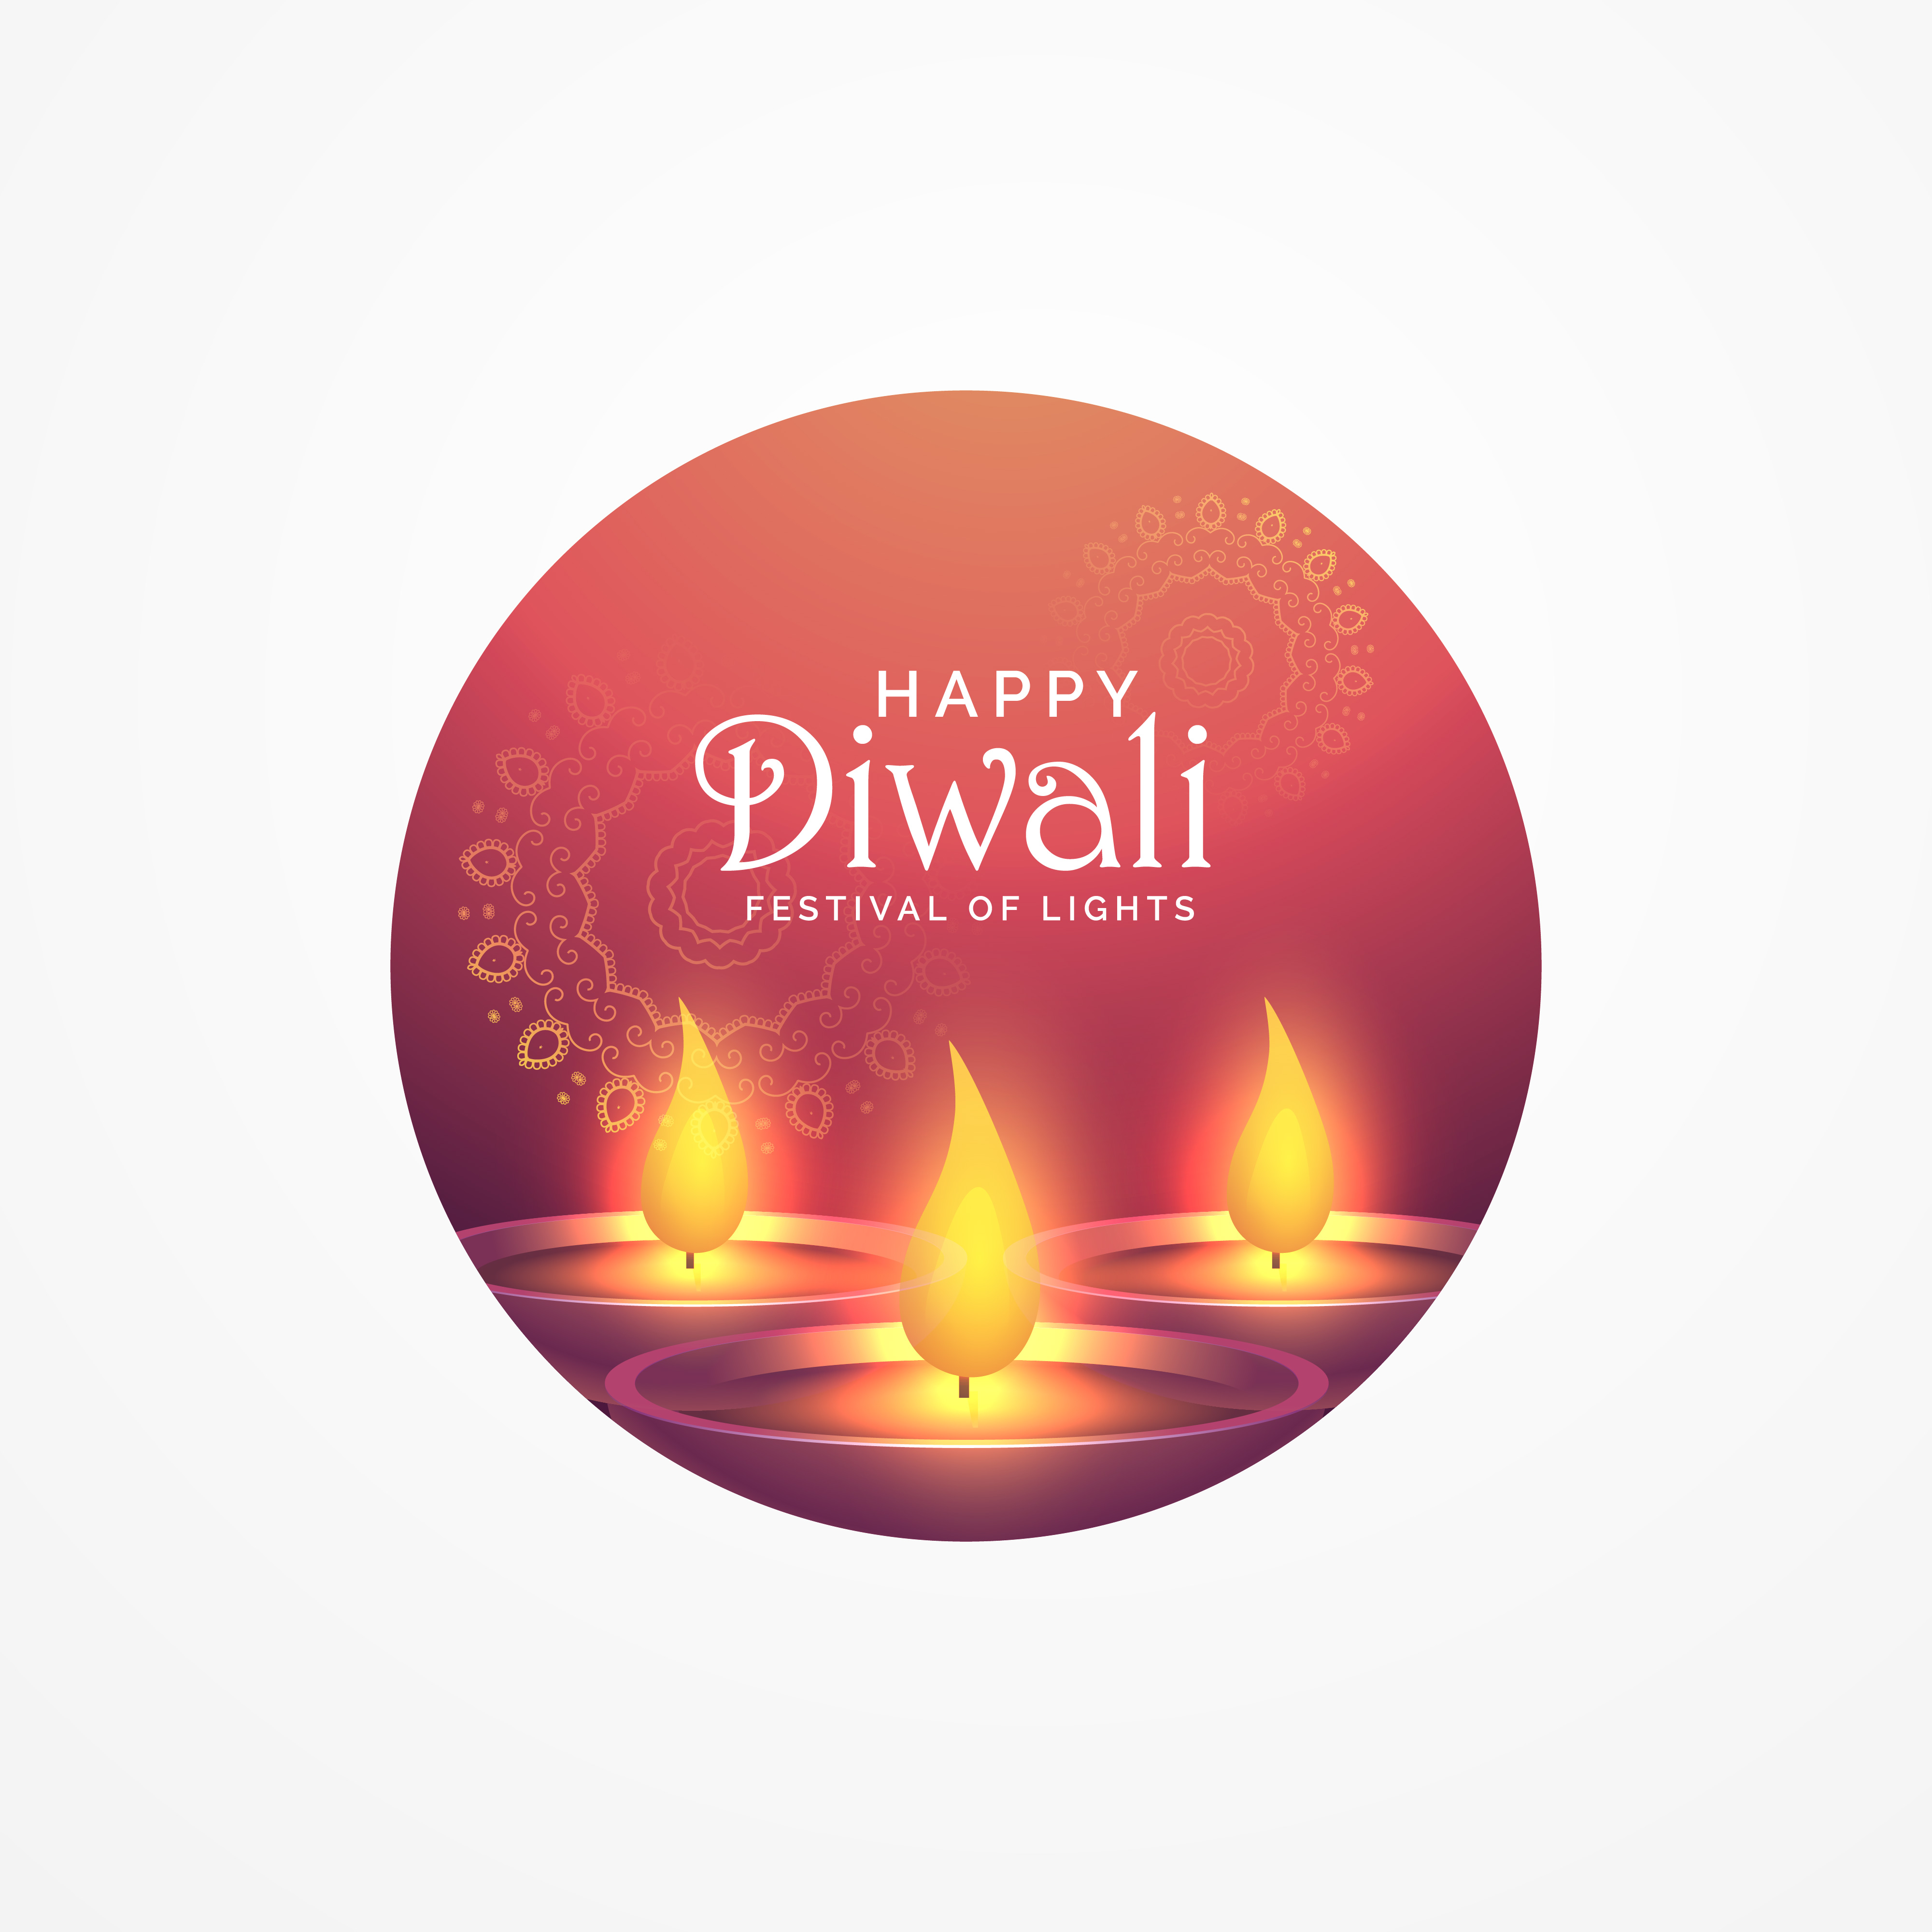 awesome diwali greeting card design with burning diya for